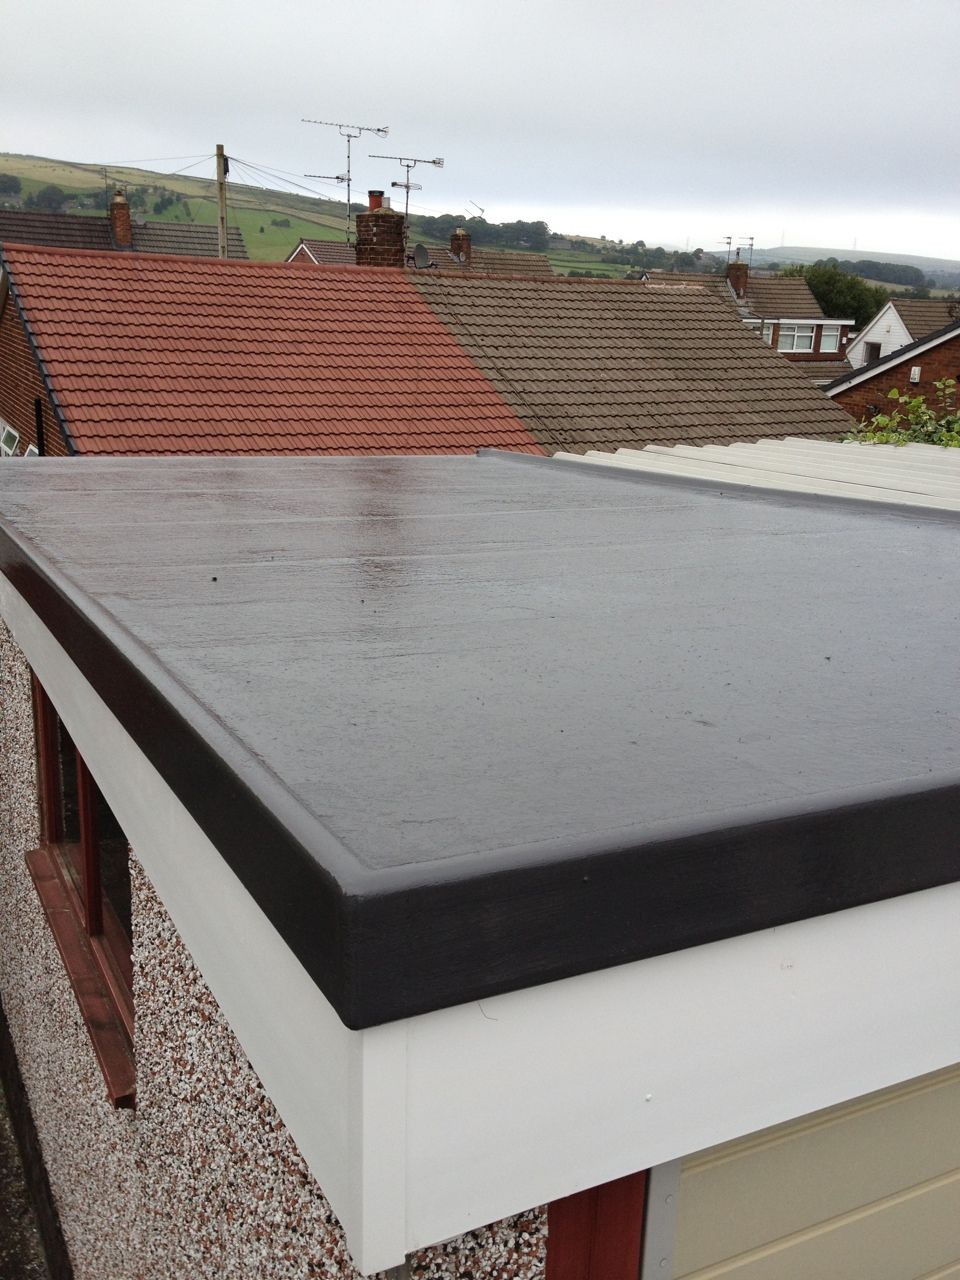 Best Grp Roofing Installation In Rochdale Lancashire Grp 640 x 480